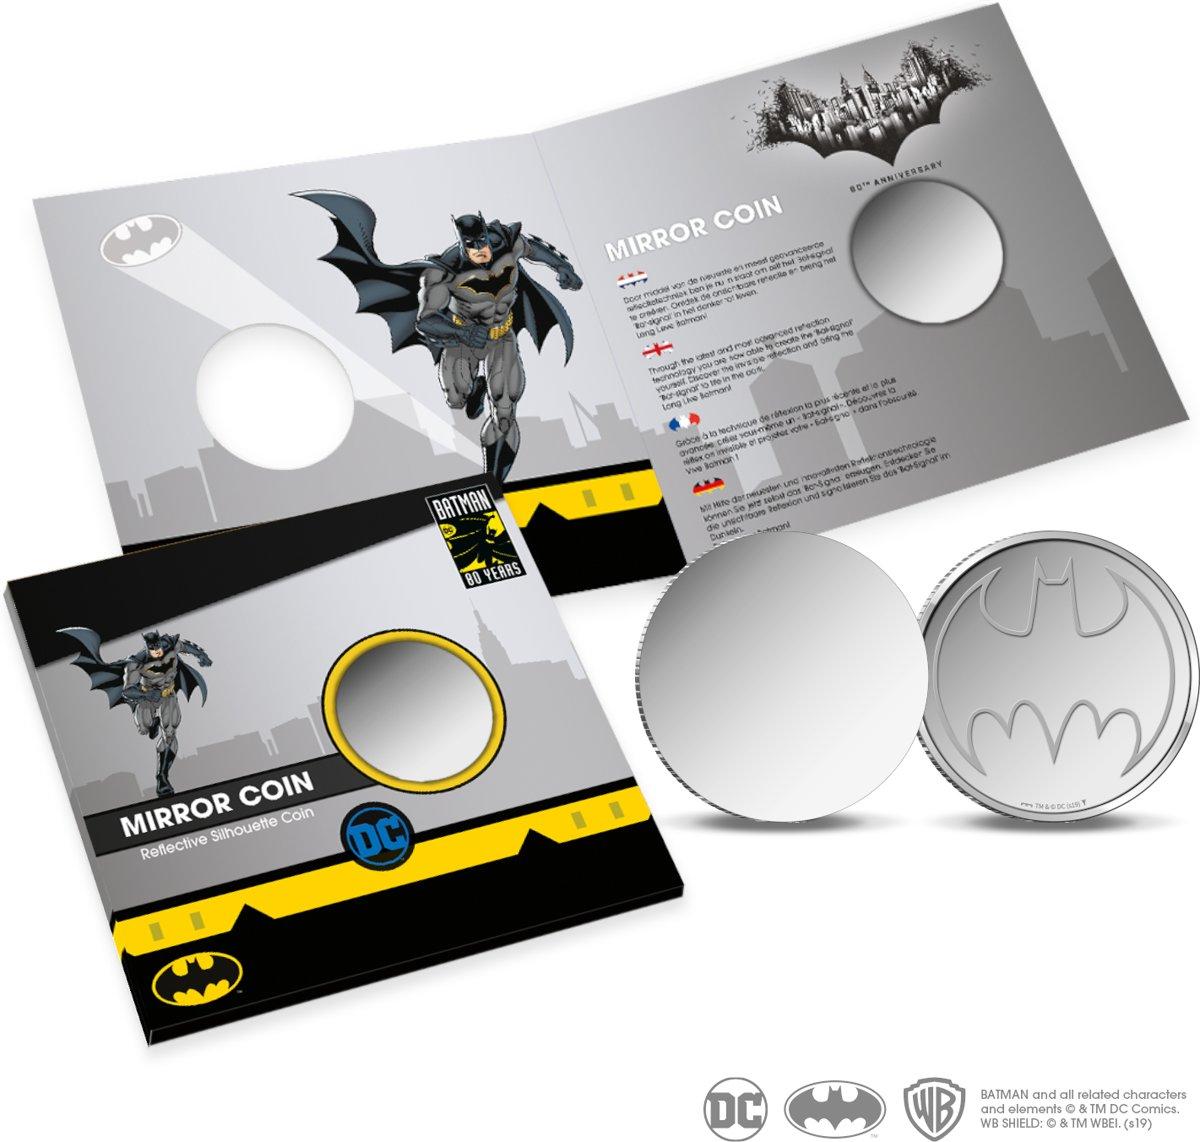 Batman munt: Mirror Coin